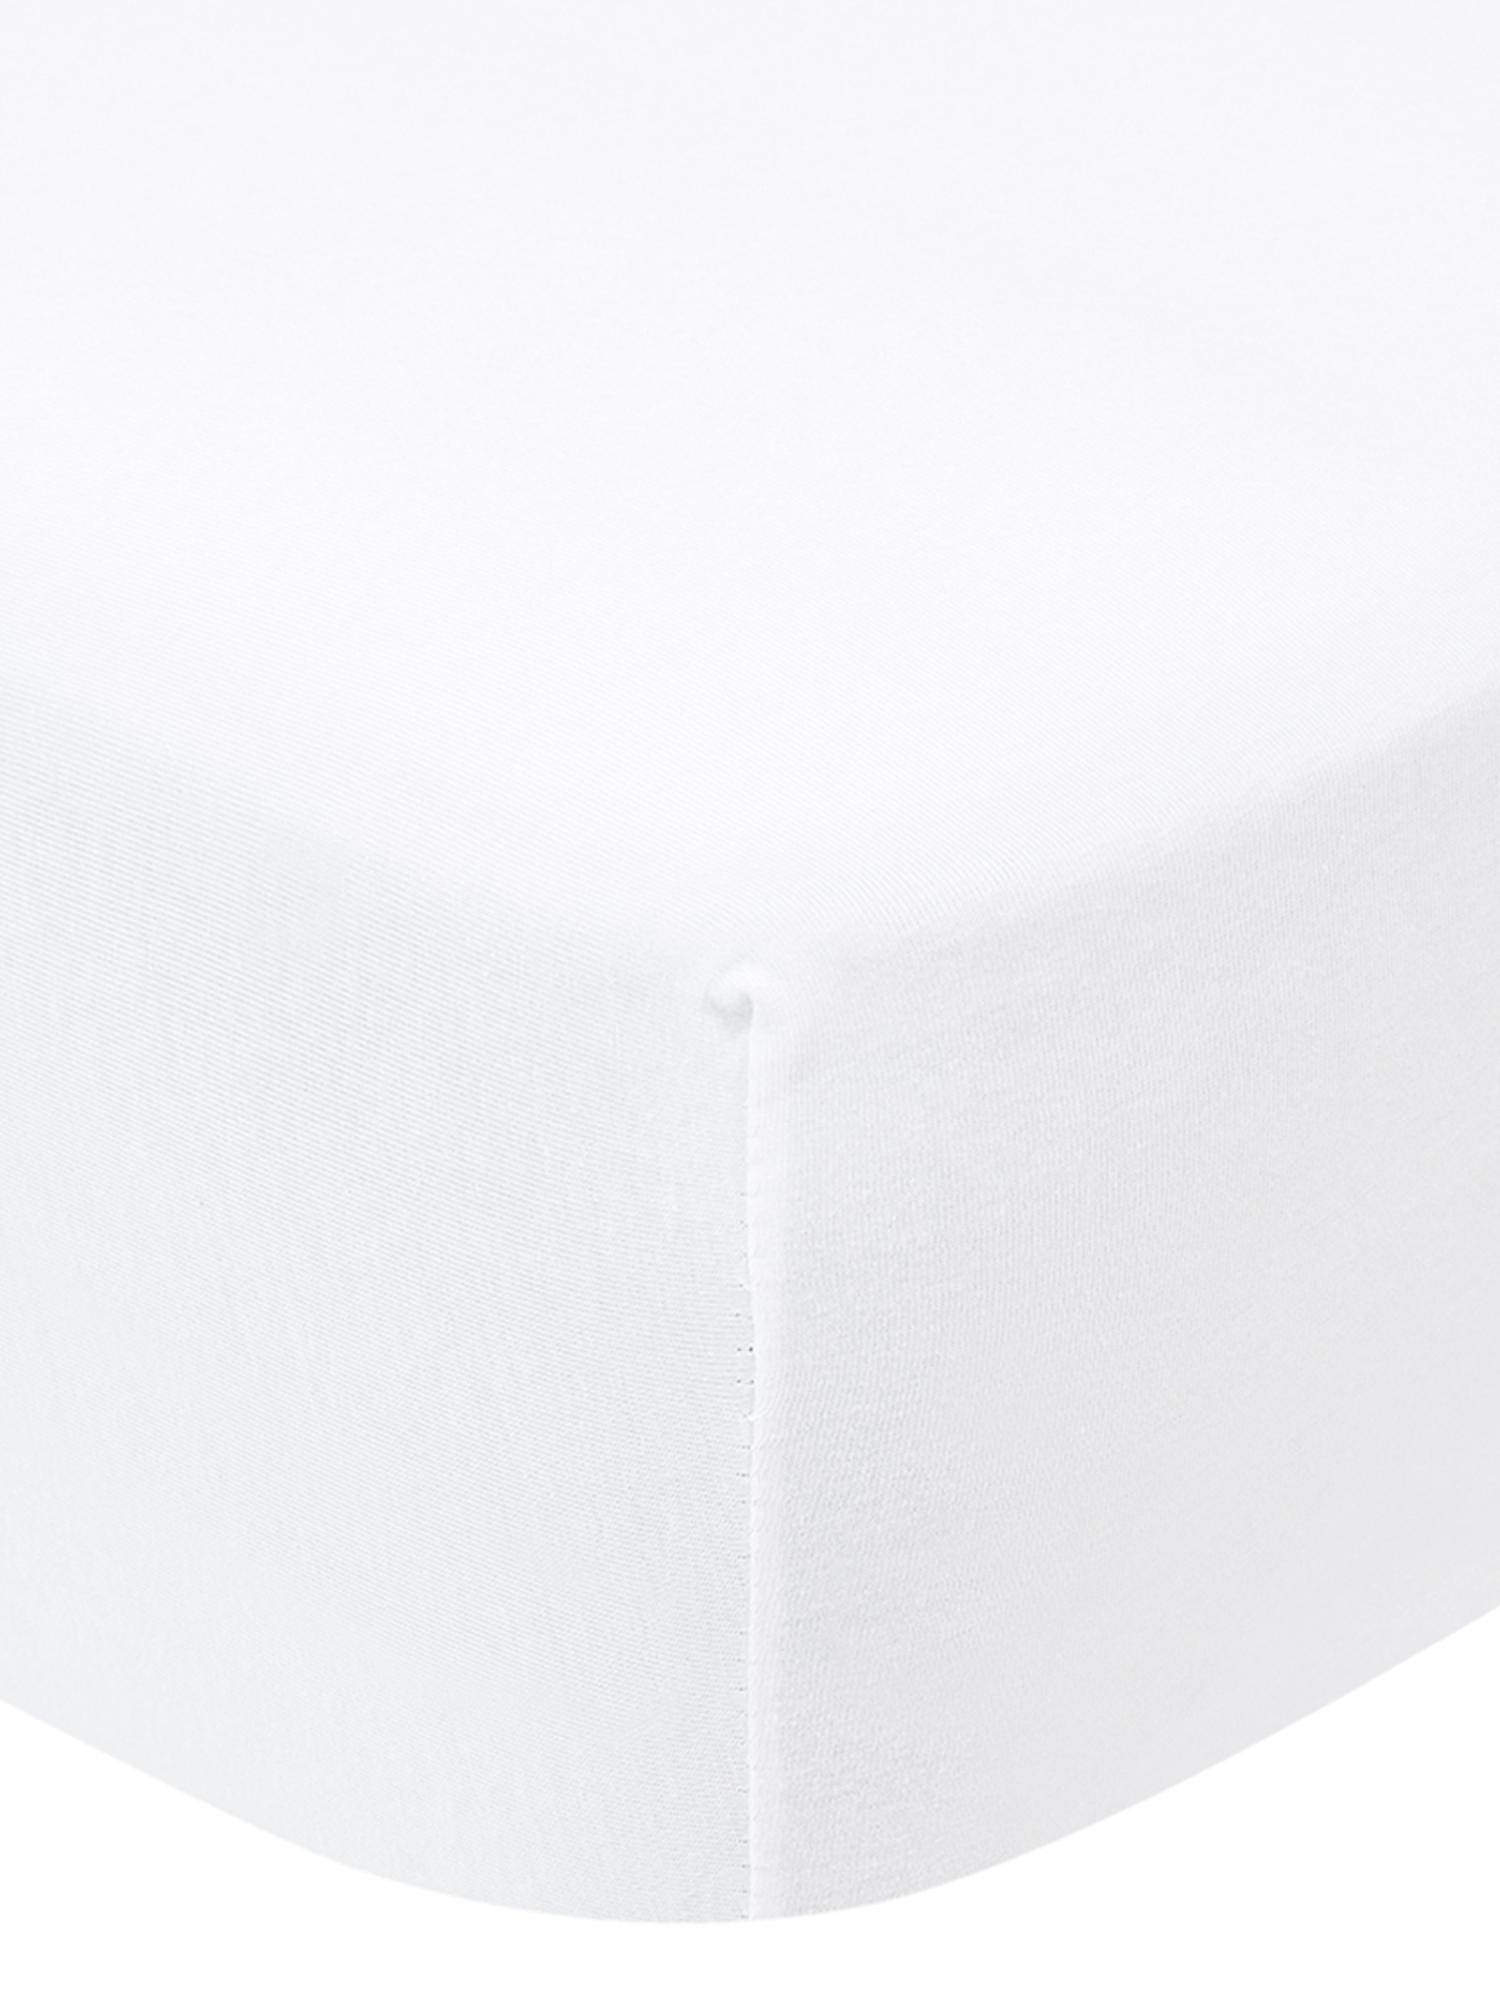 Boxspring-Spannbettlaken Lara, Jersey-Elasthan, 95% Baumwolle, 5% Elasthan, Weiß, 160 x 200 cm